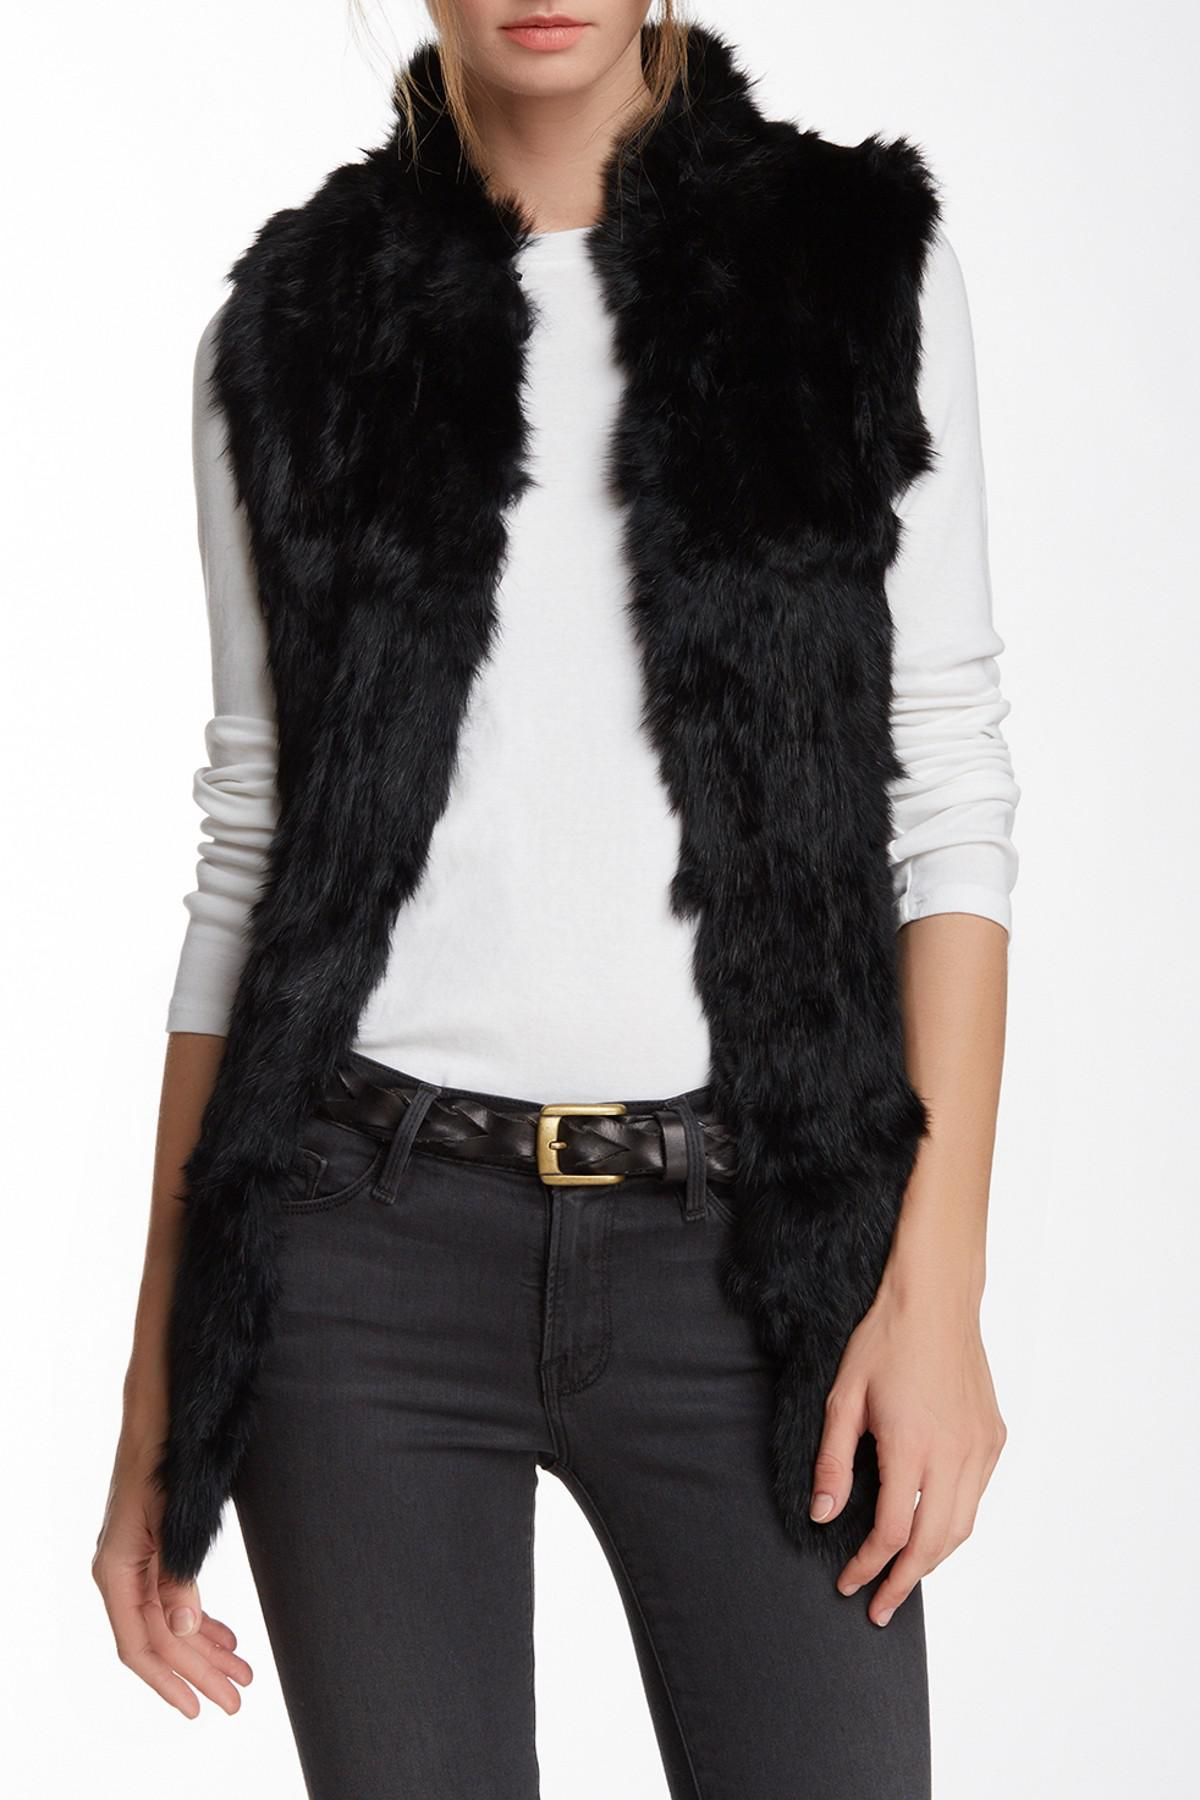 61b9c9bab Love Token Genuine Rabbit Fur & Knit Vest (nordstrom Exclusive) in ...